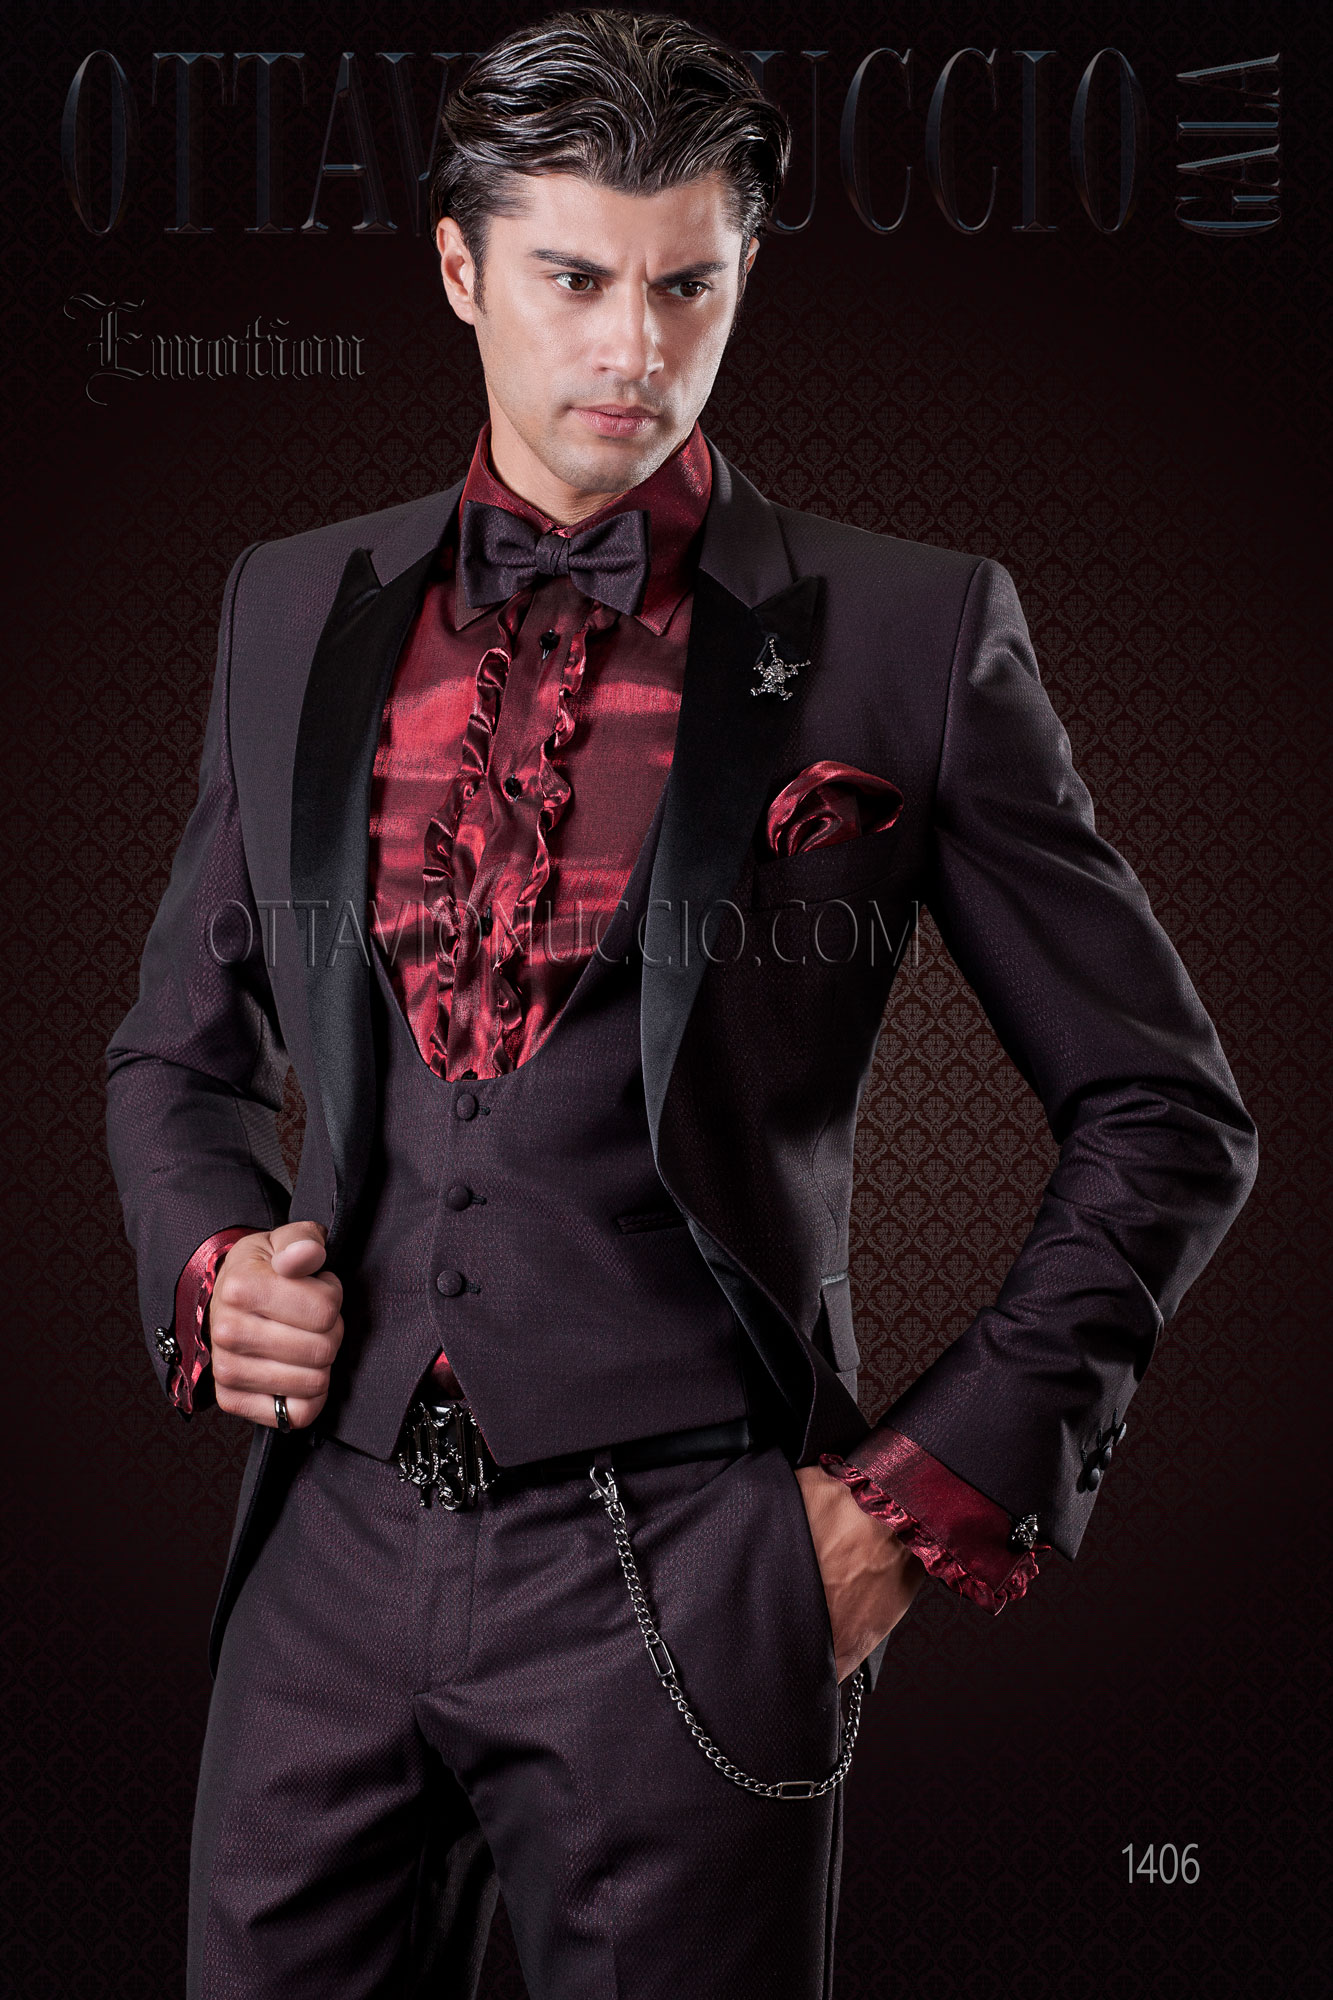 Shiny Black And Red Peak Lapel Groom Suit